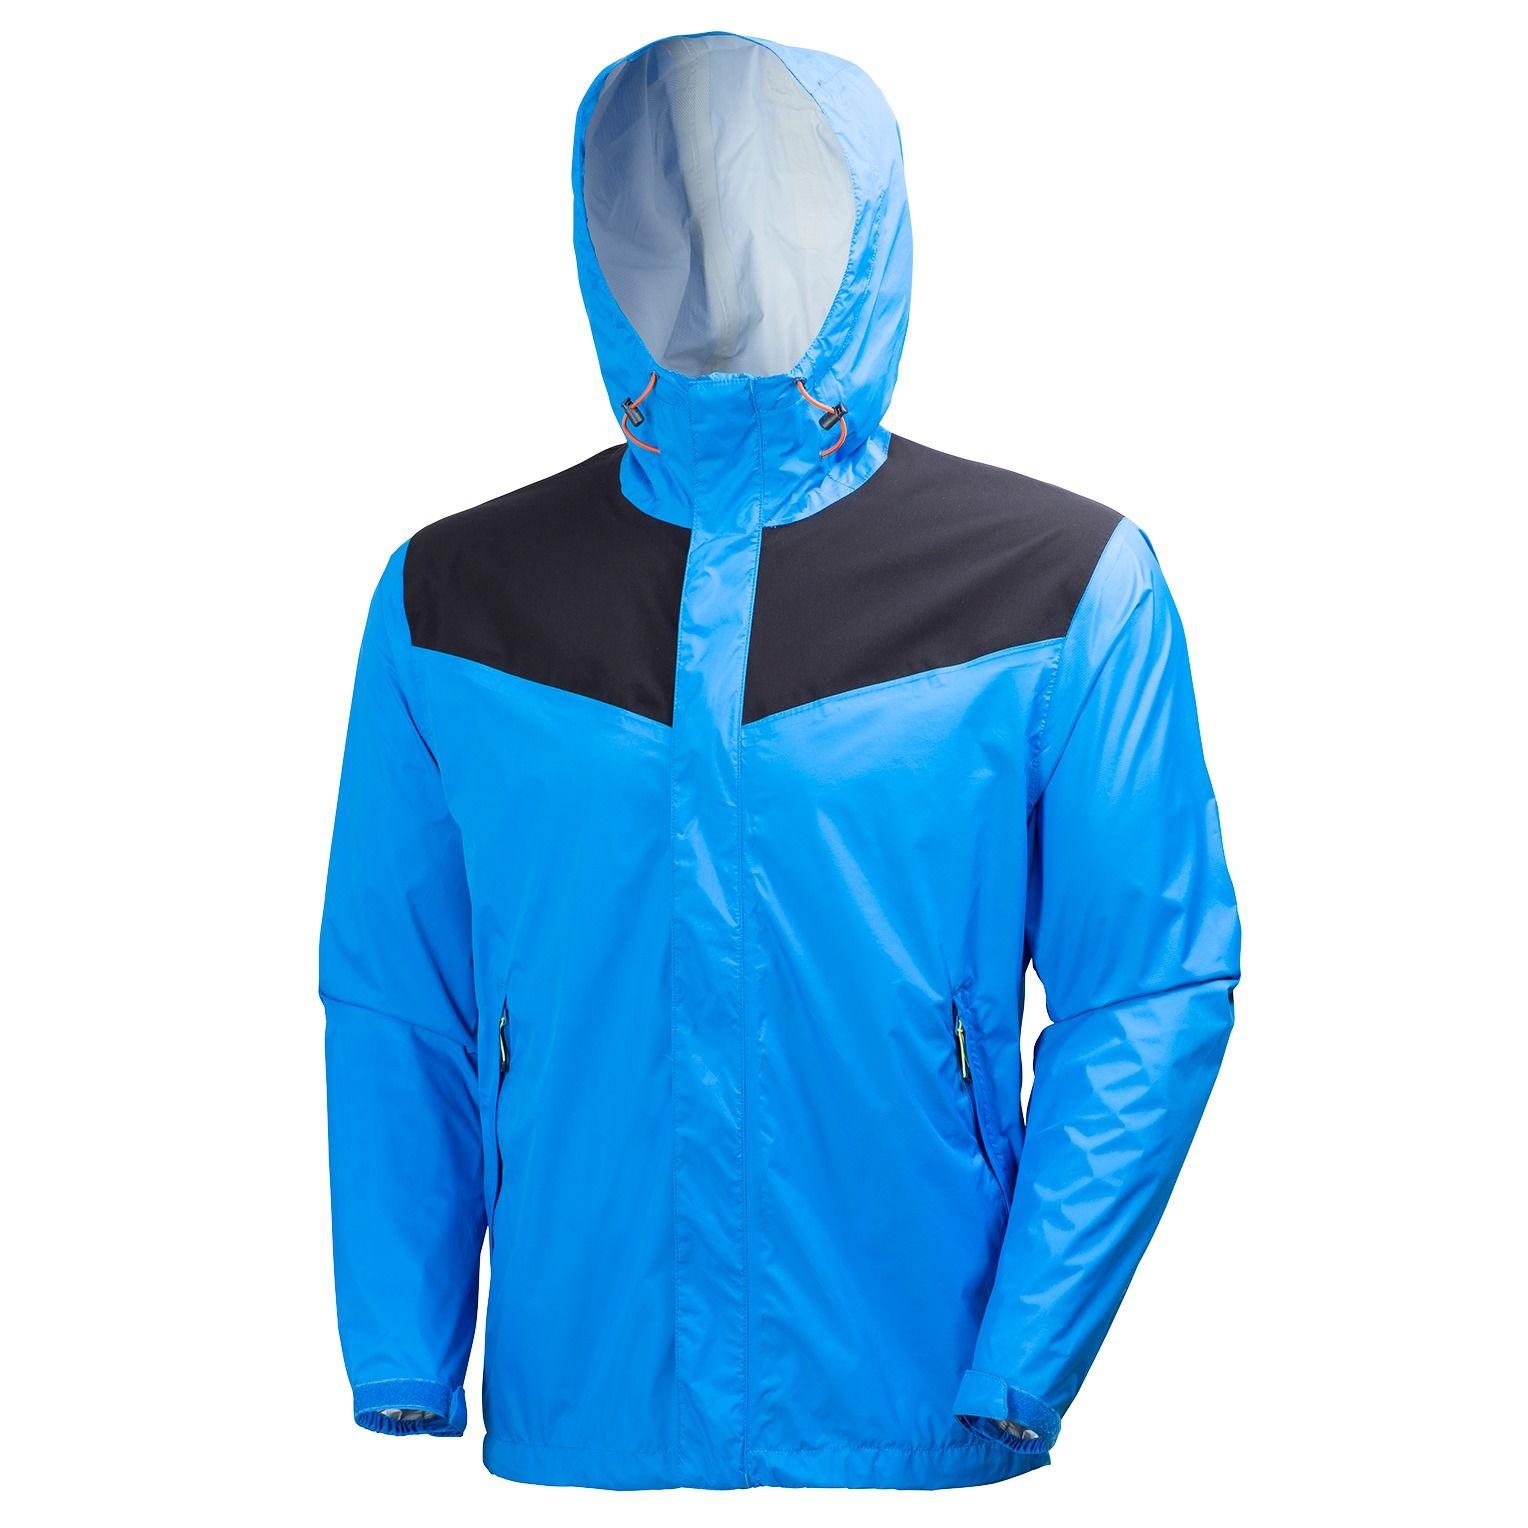 a52415f0 magni light jacket/arbeidstøy/arbeidsjakke/helly hansen/haugseng.no